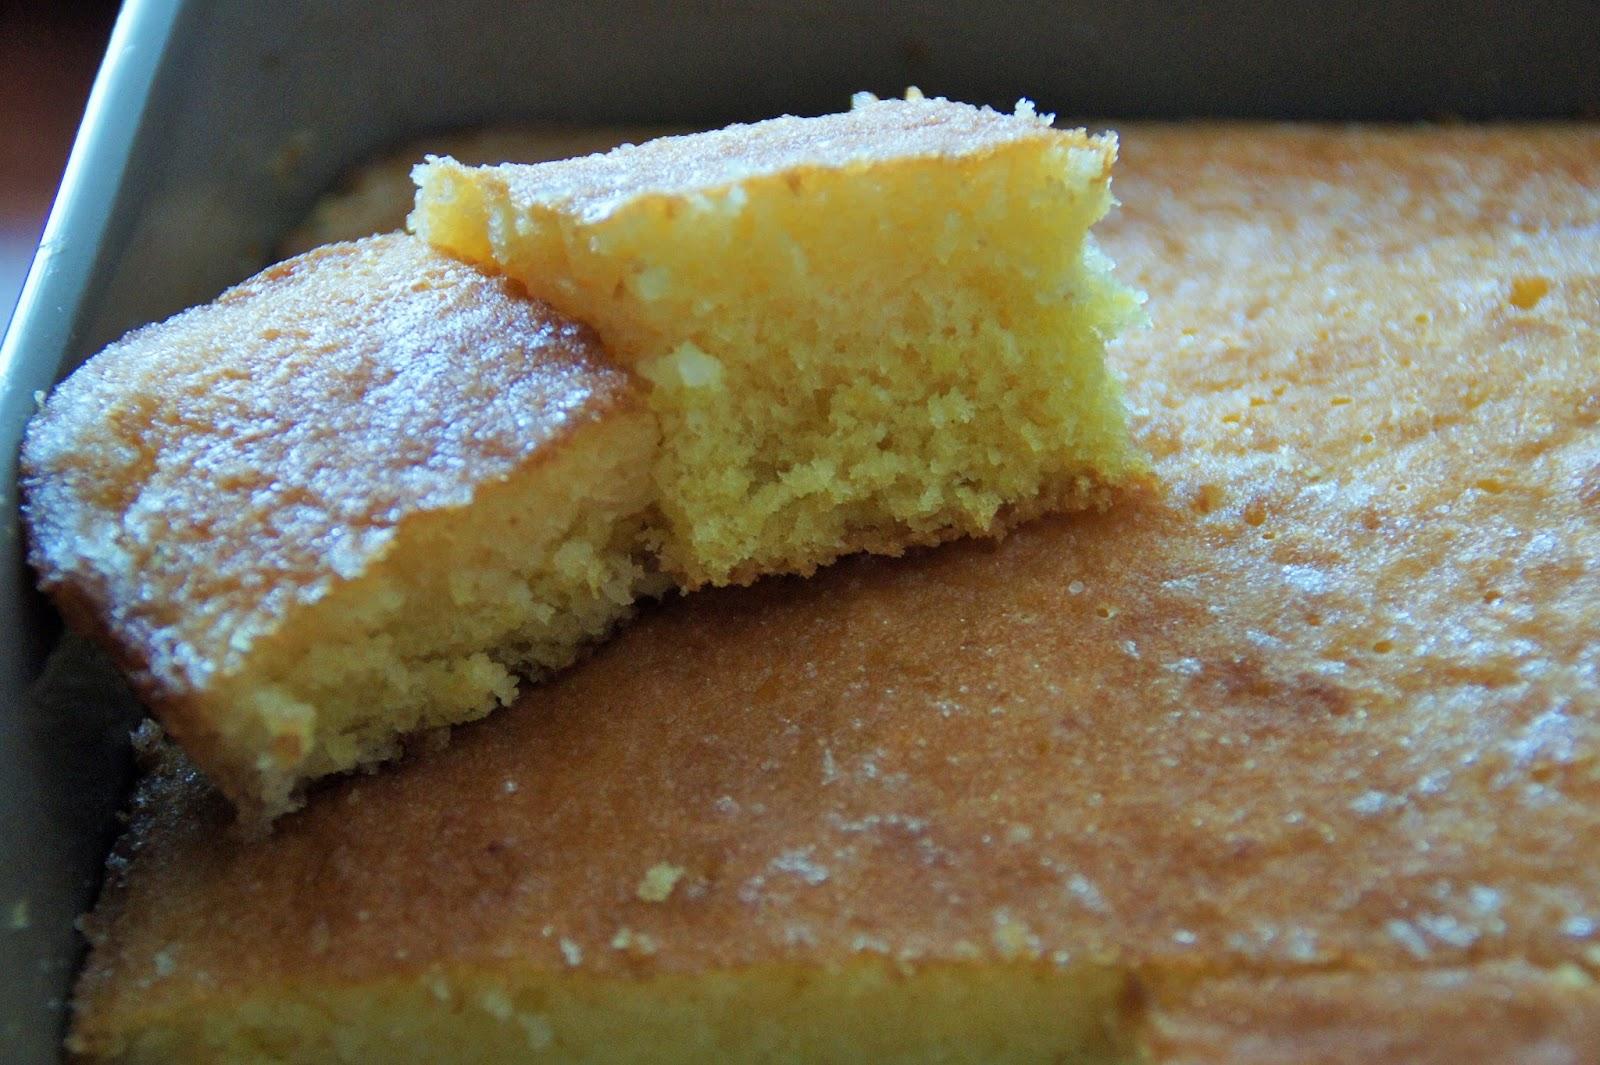 Lemon Drizzle Cake With Yellow Cake Mix